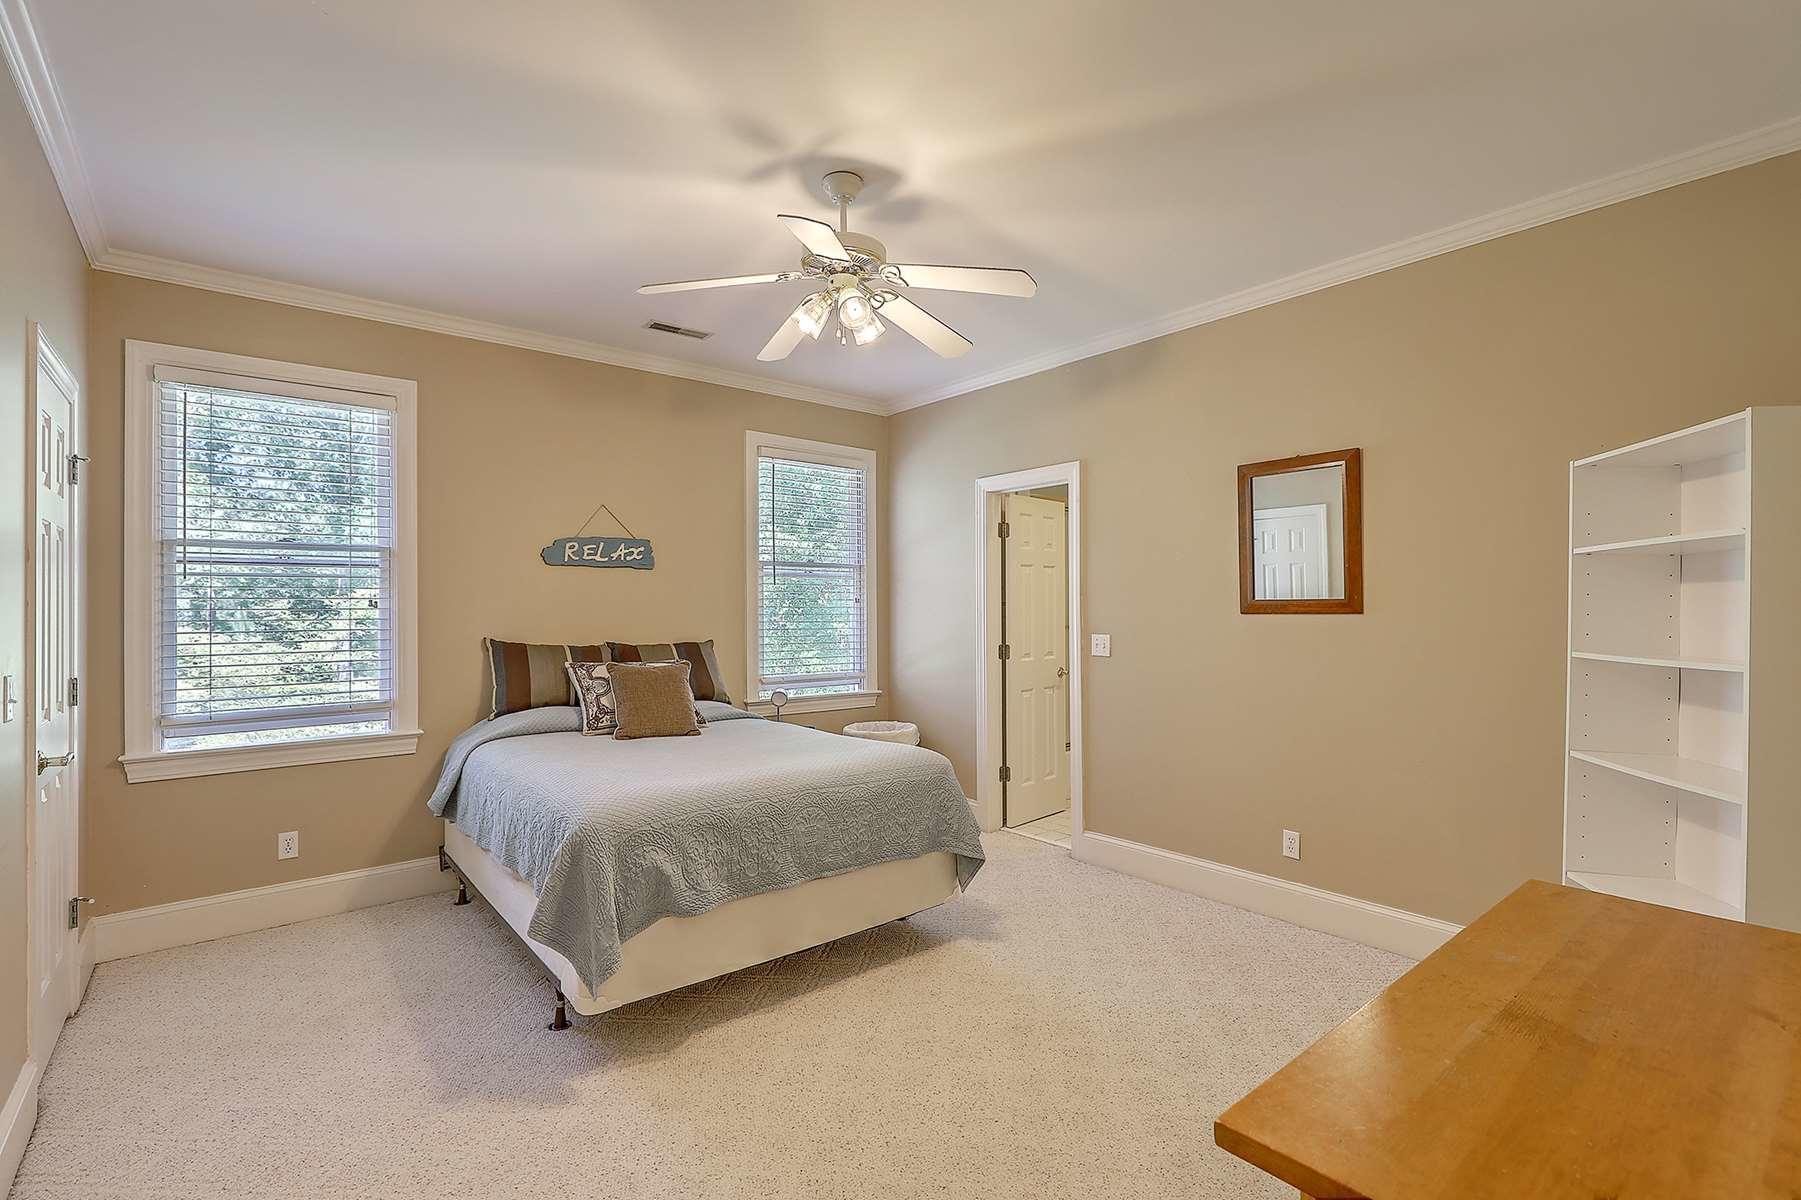 Dunes West Homes For Sale - 2961 Pignatelli, Mount Pleasant, SC - 47